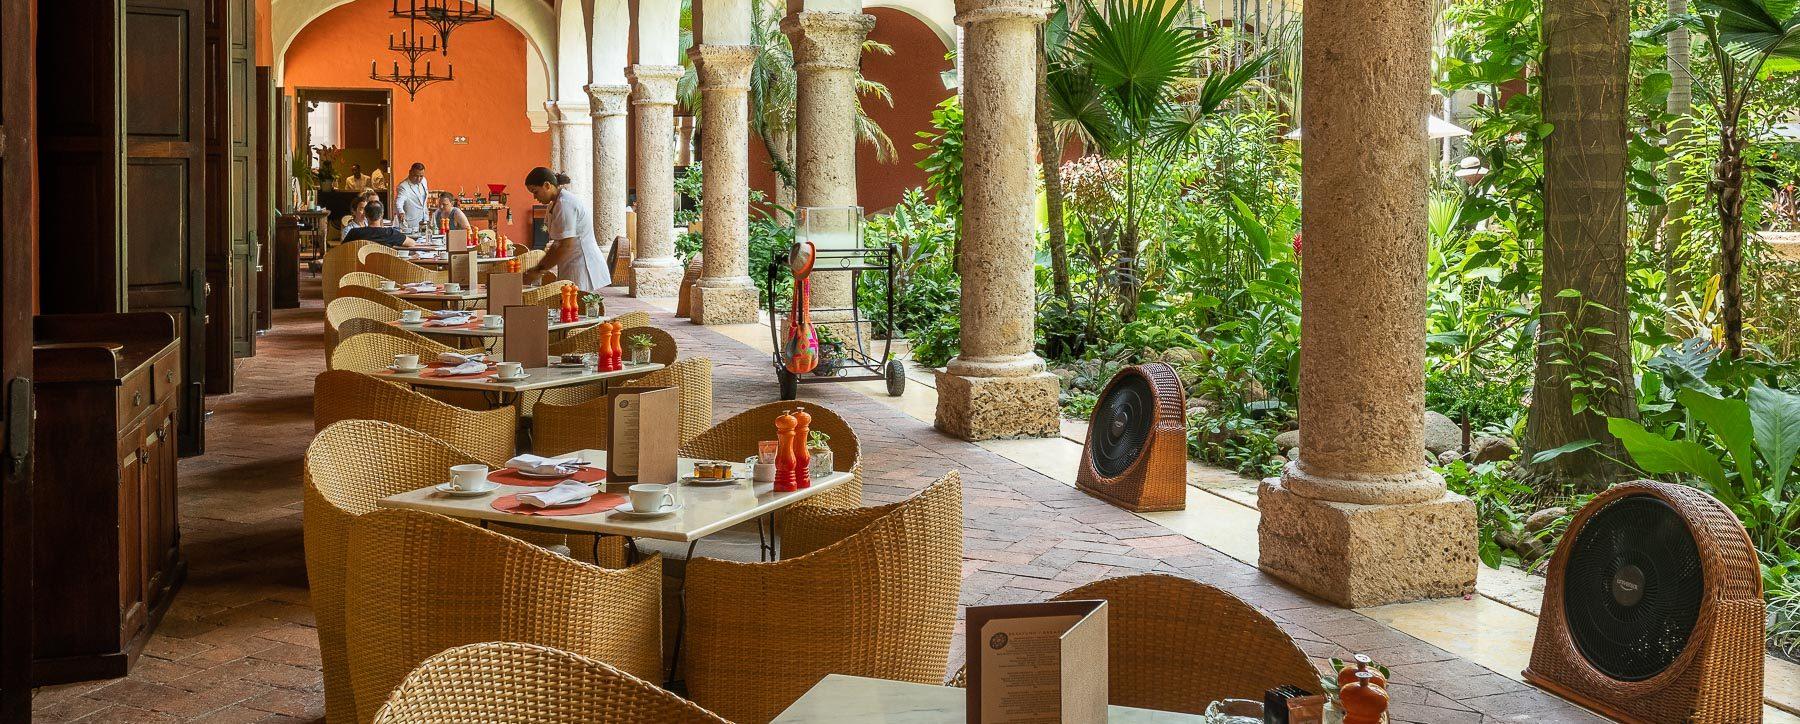 Colonial breakfast Santa Clara Hotel